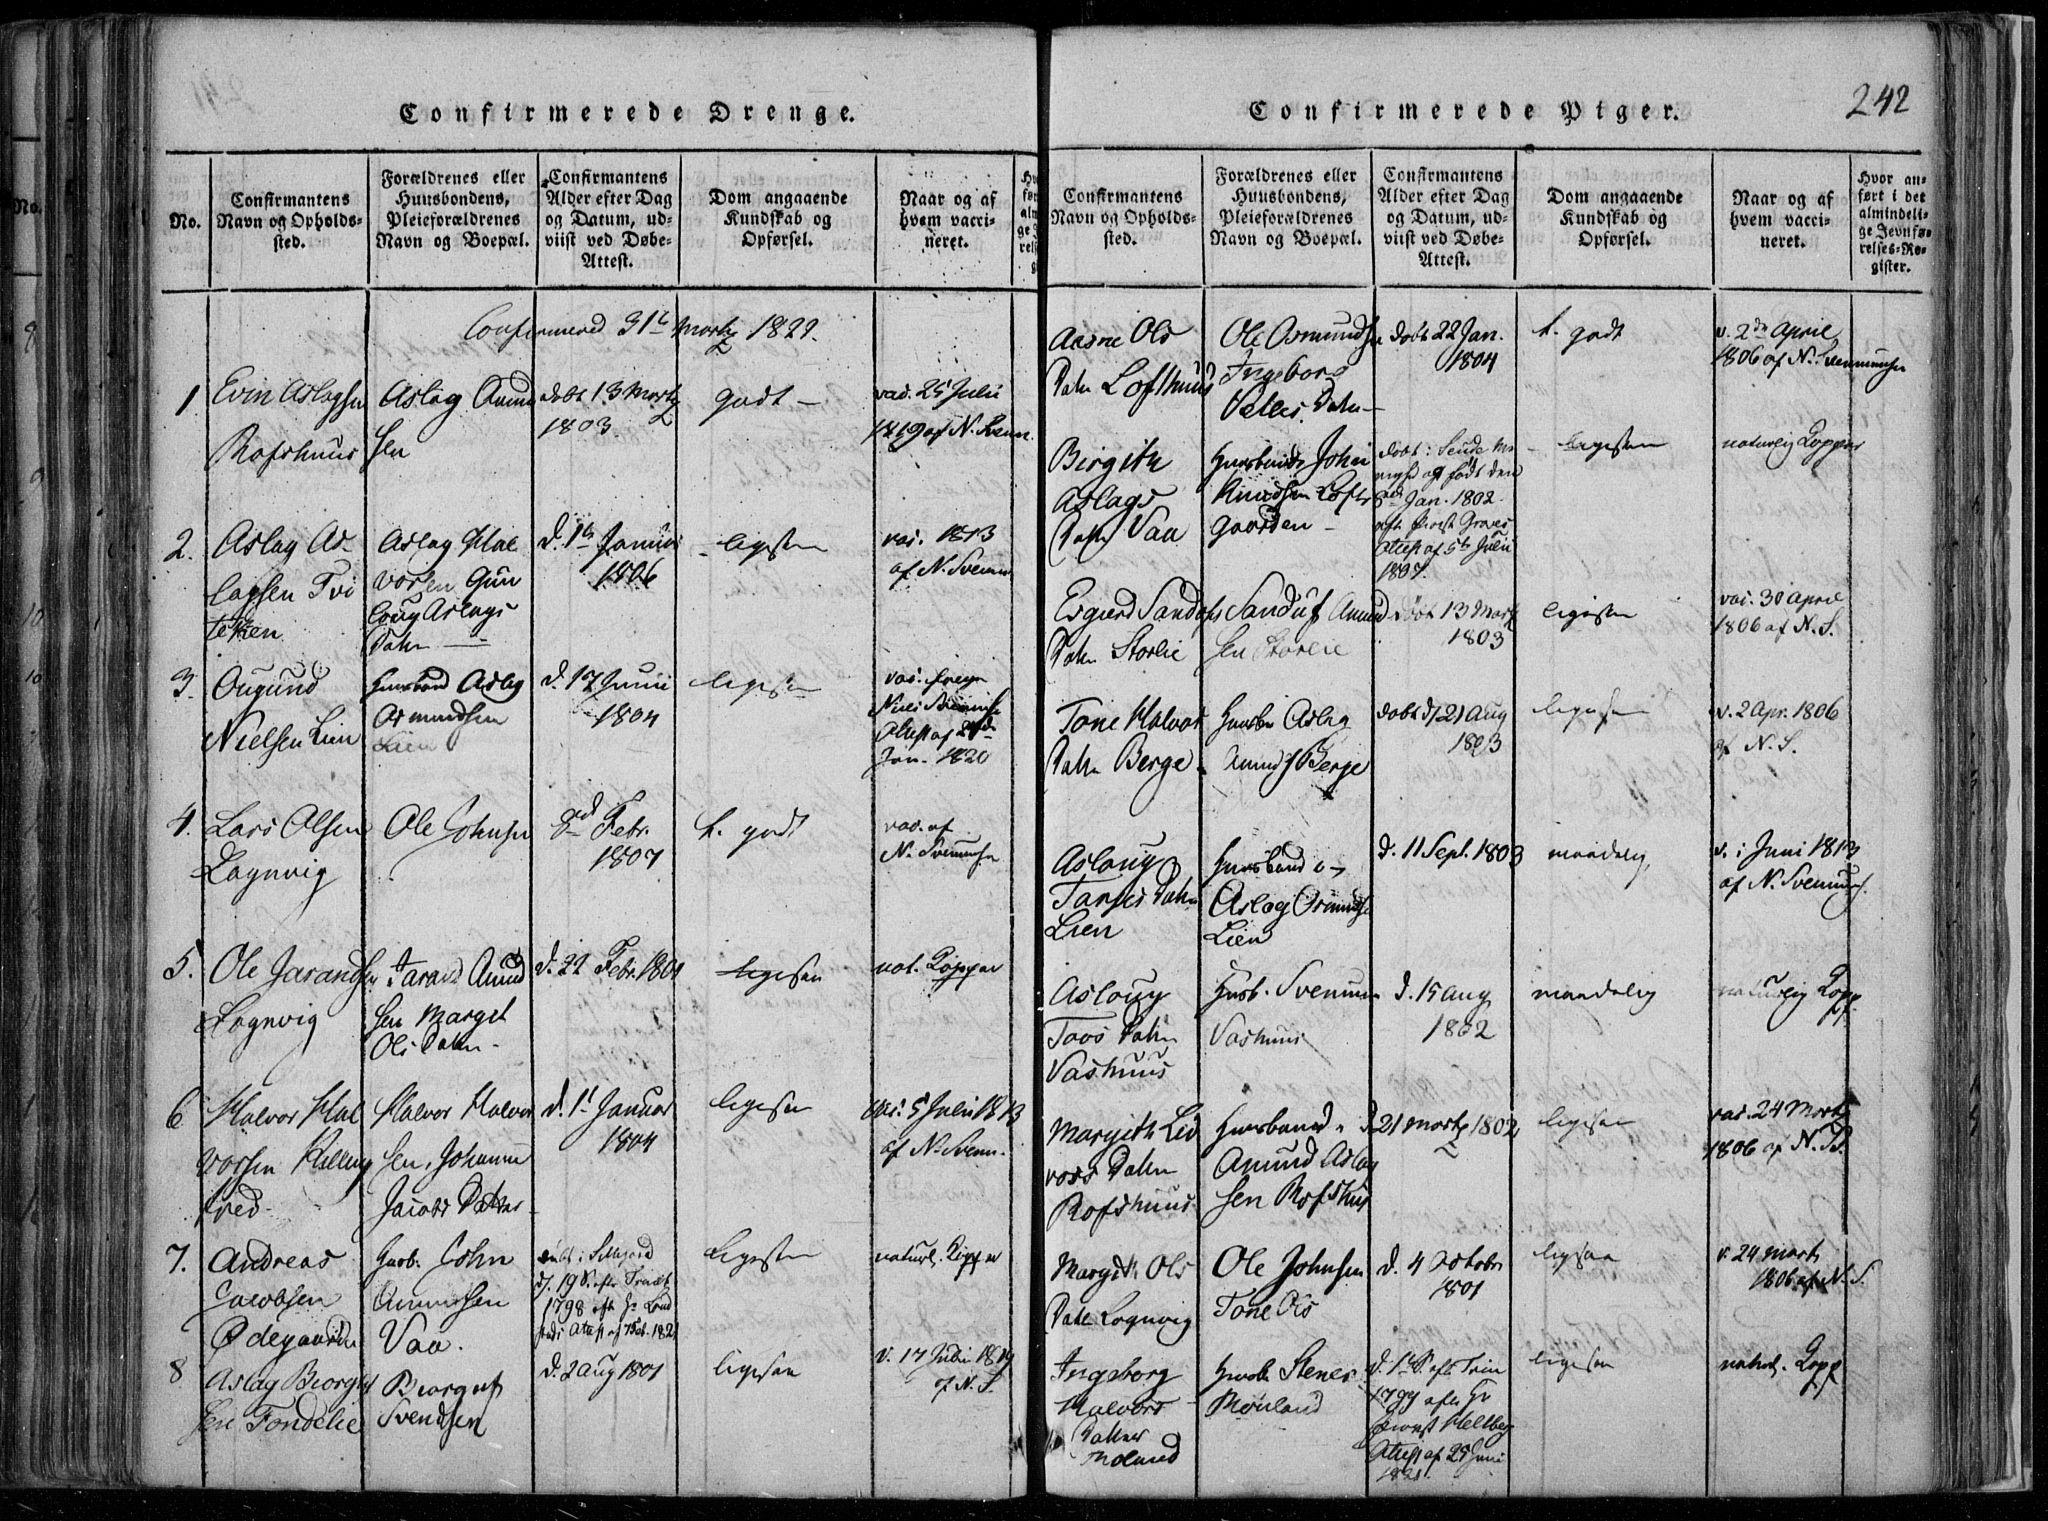 SAKO, Rauland kirkebøker, F/Fa/L0001: Ministerialbok nr. 1, 1814-1859, s. 242